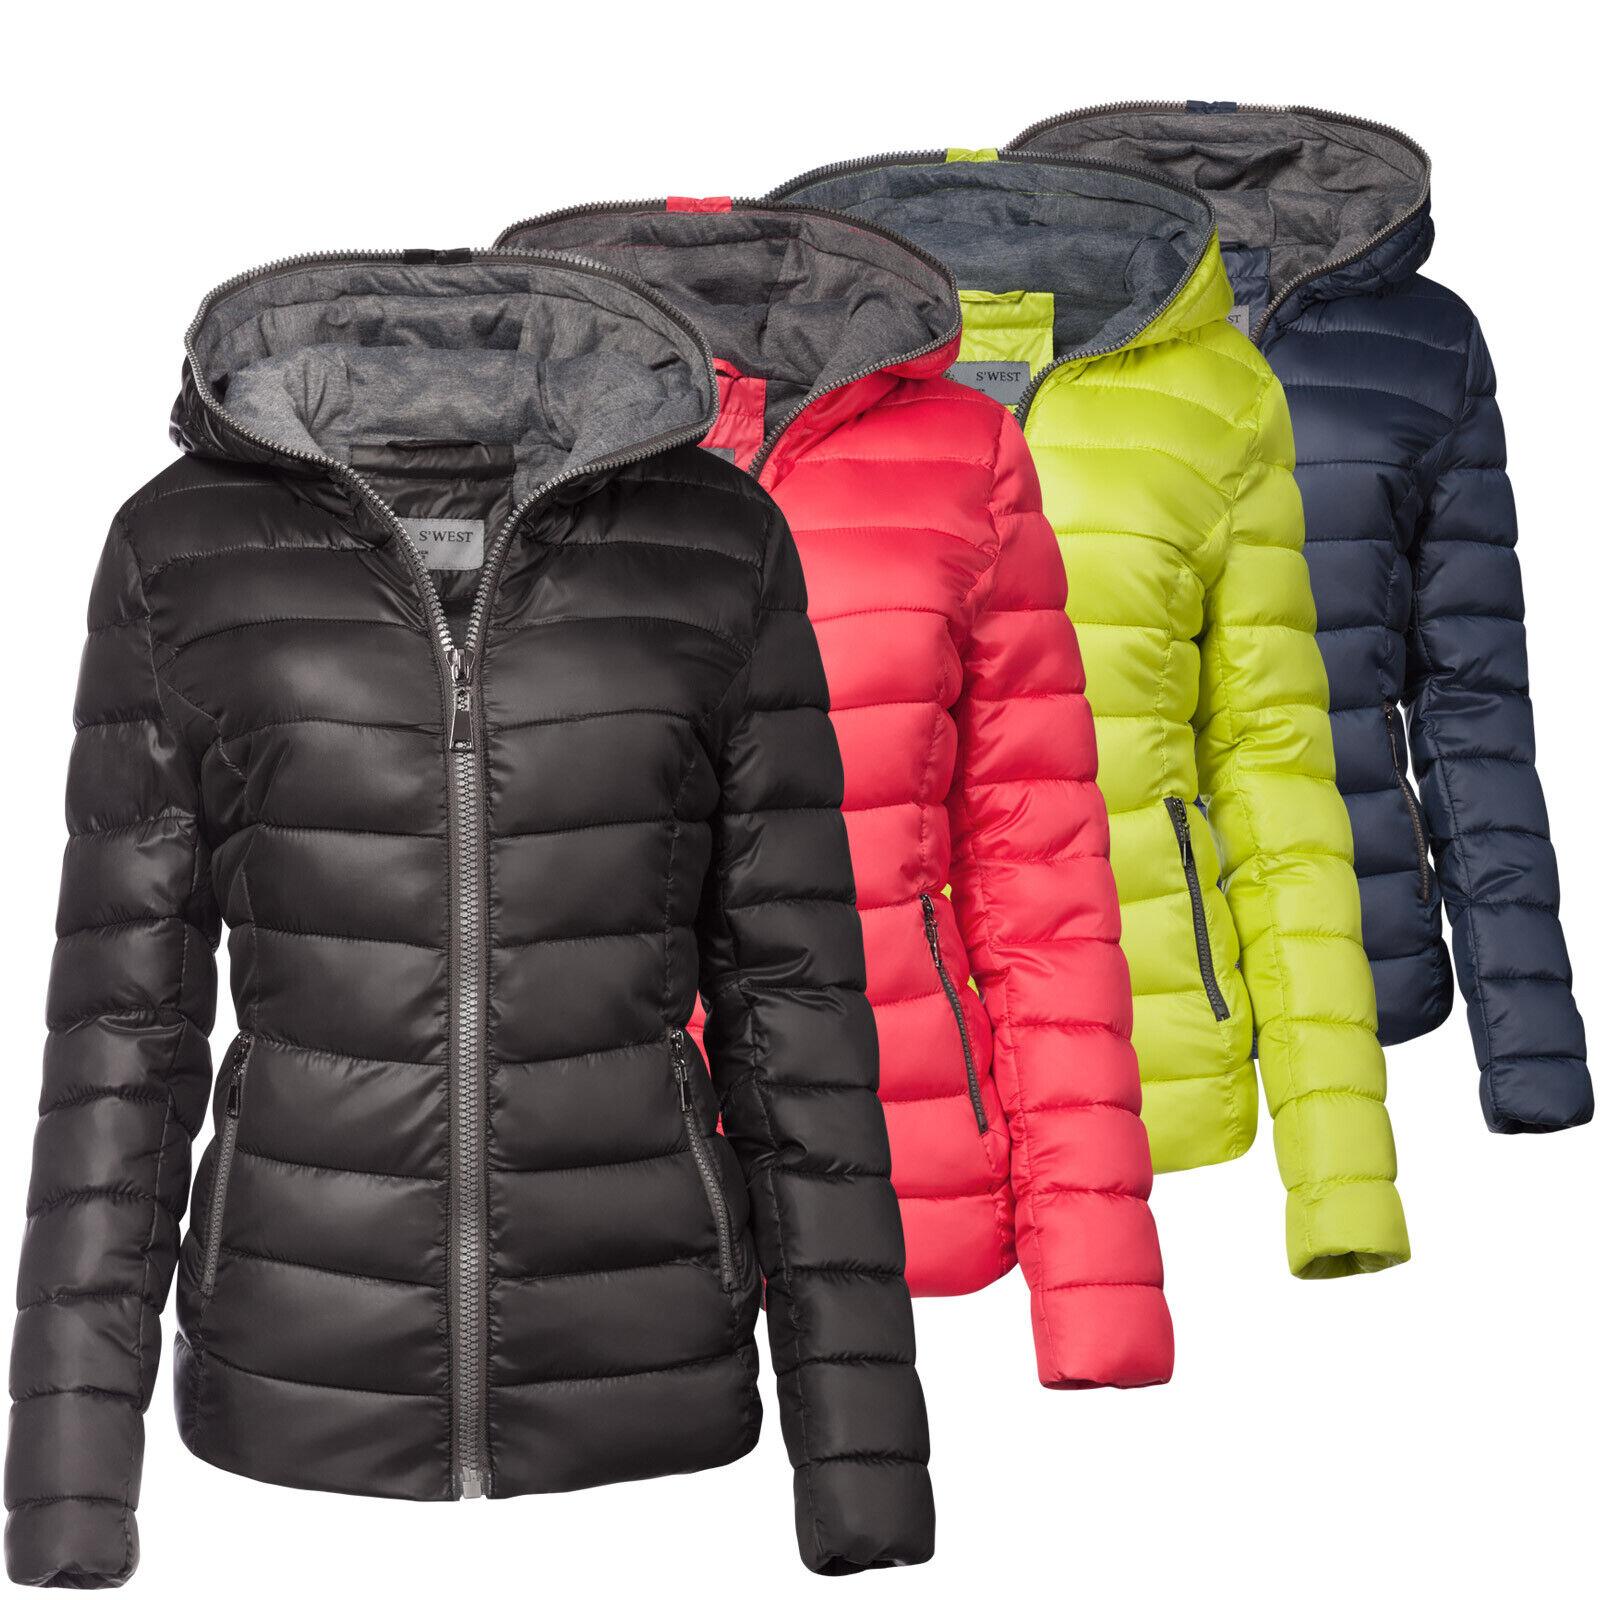 Damen Steppjacke Daunen Optik Ski Jacke Kurz Mantel Parka Kapuze Top Farben